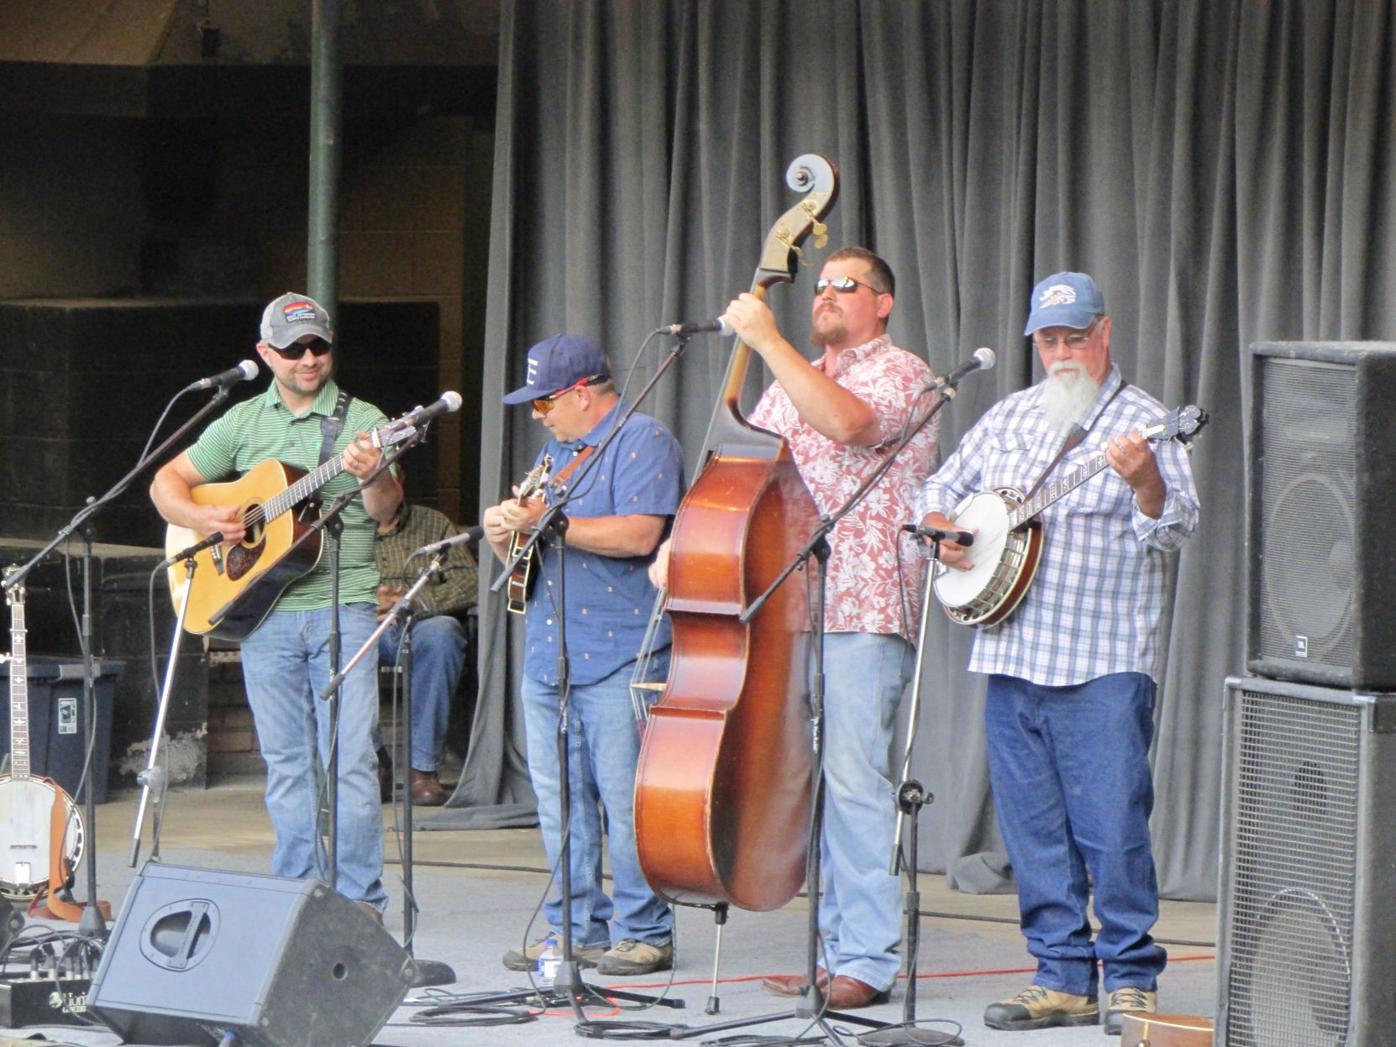 Steve Lewis and Bluegrass, Inc.